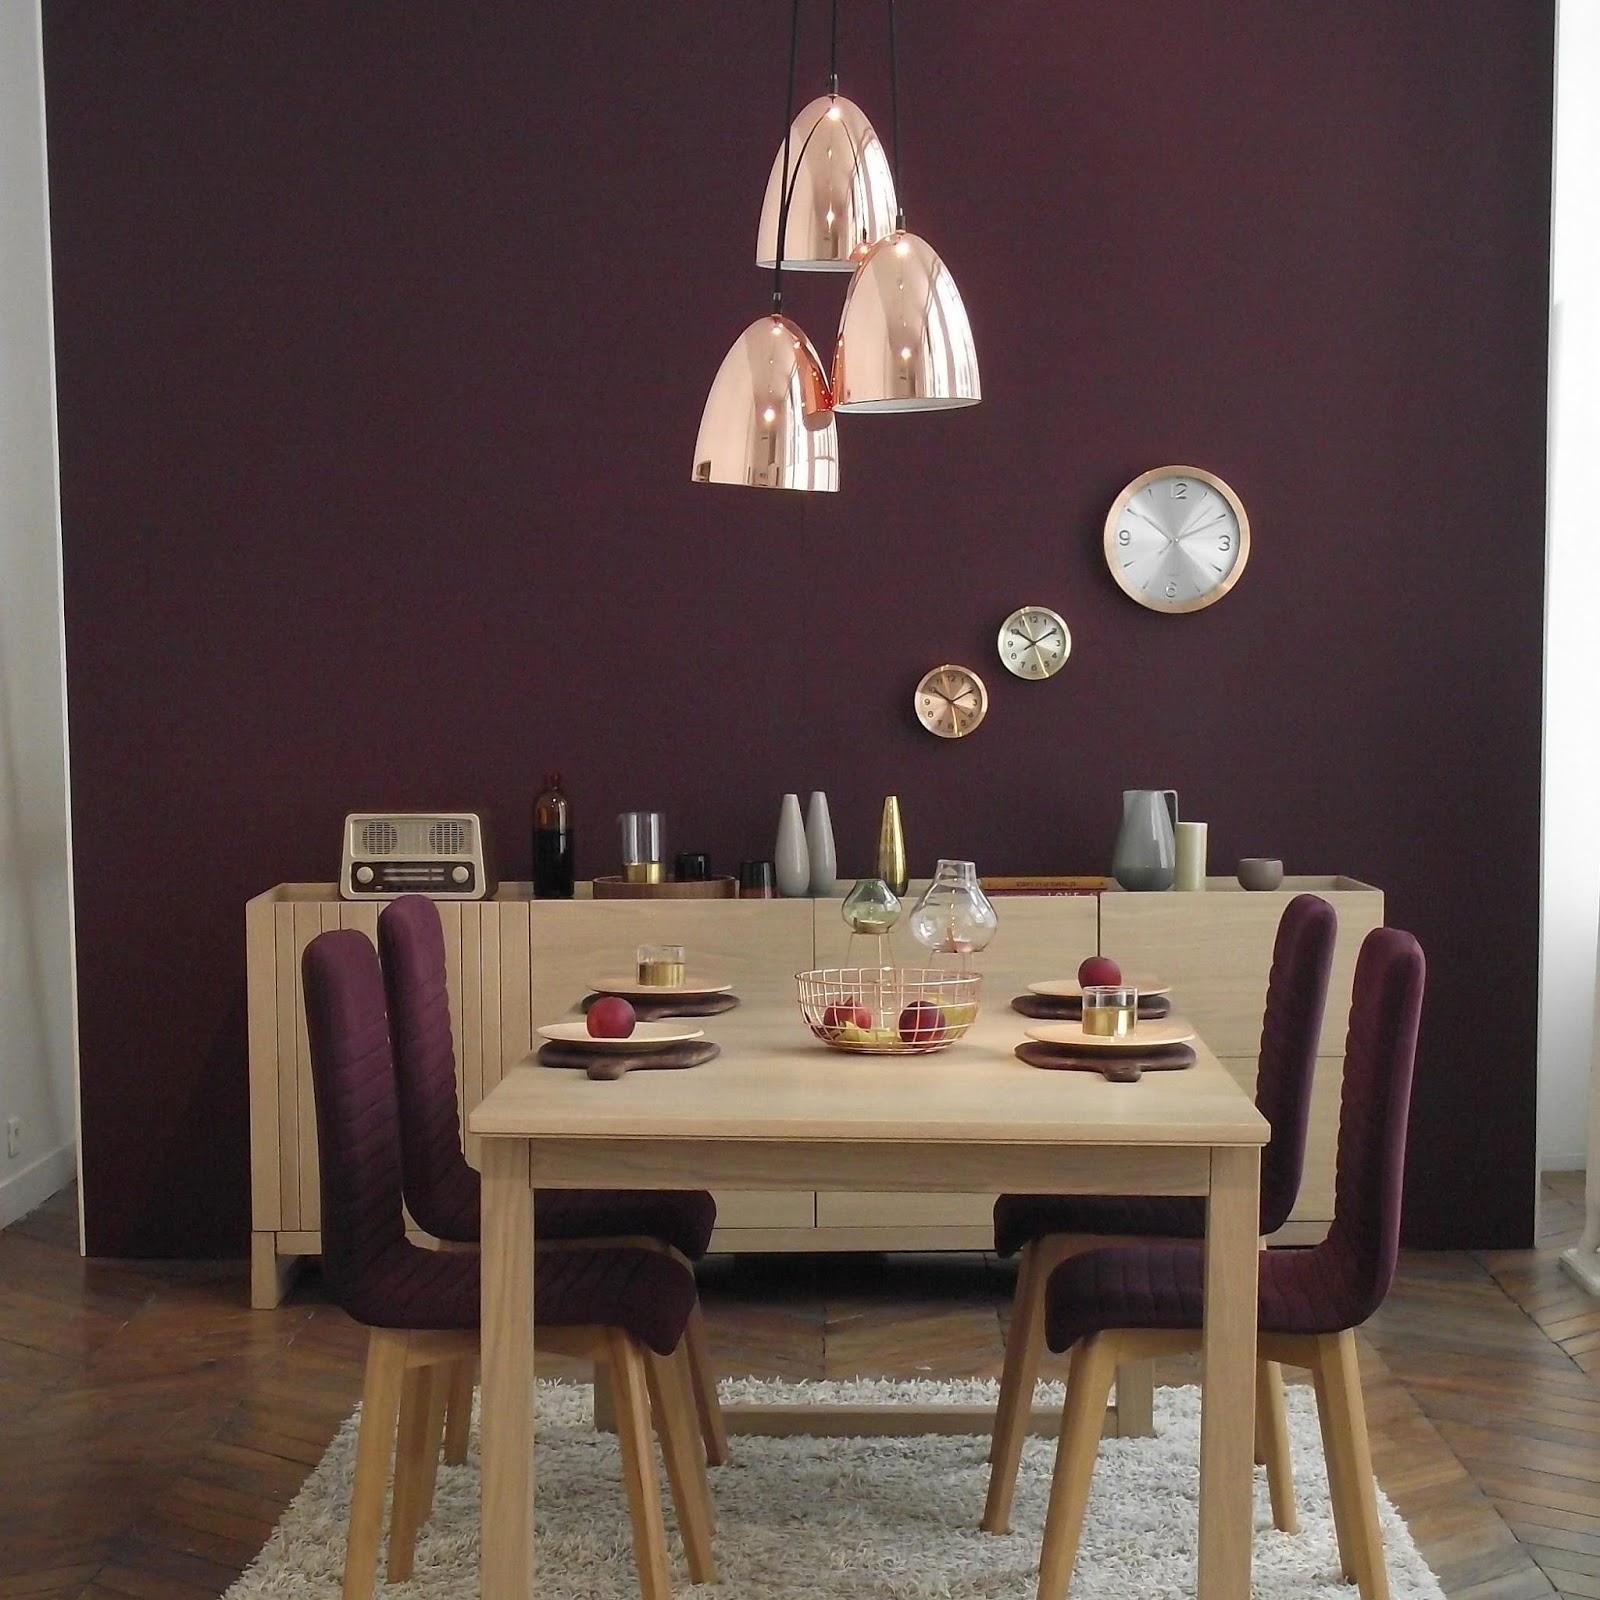 Salon moderne marocain: boutique salon marocain /: décoration ...